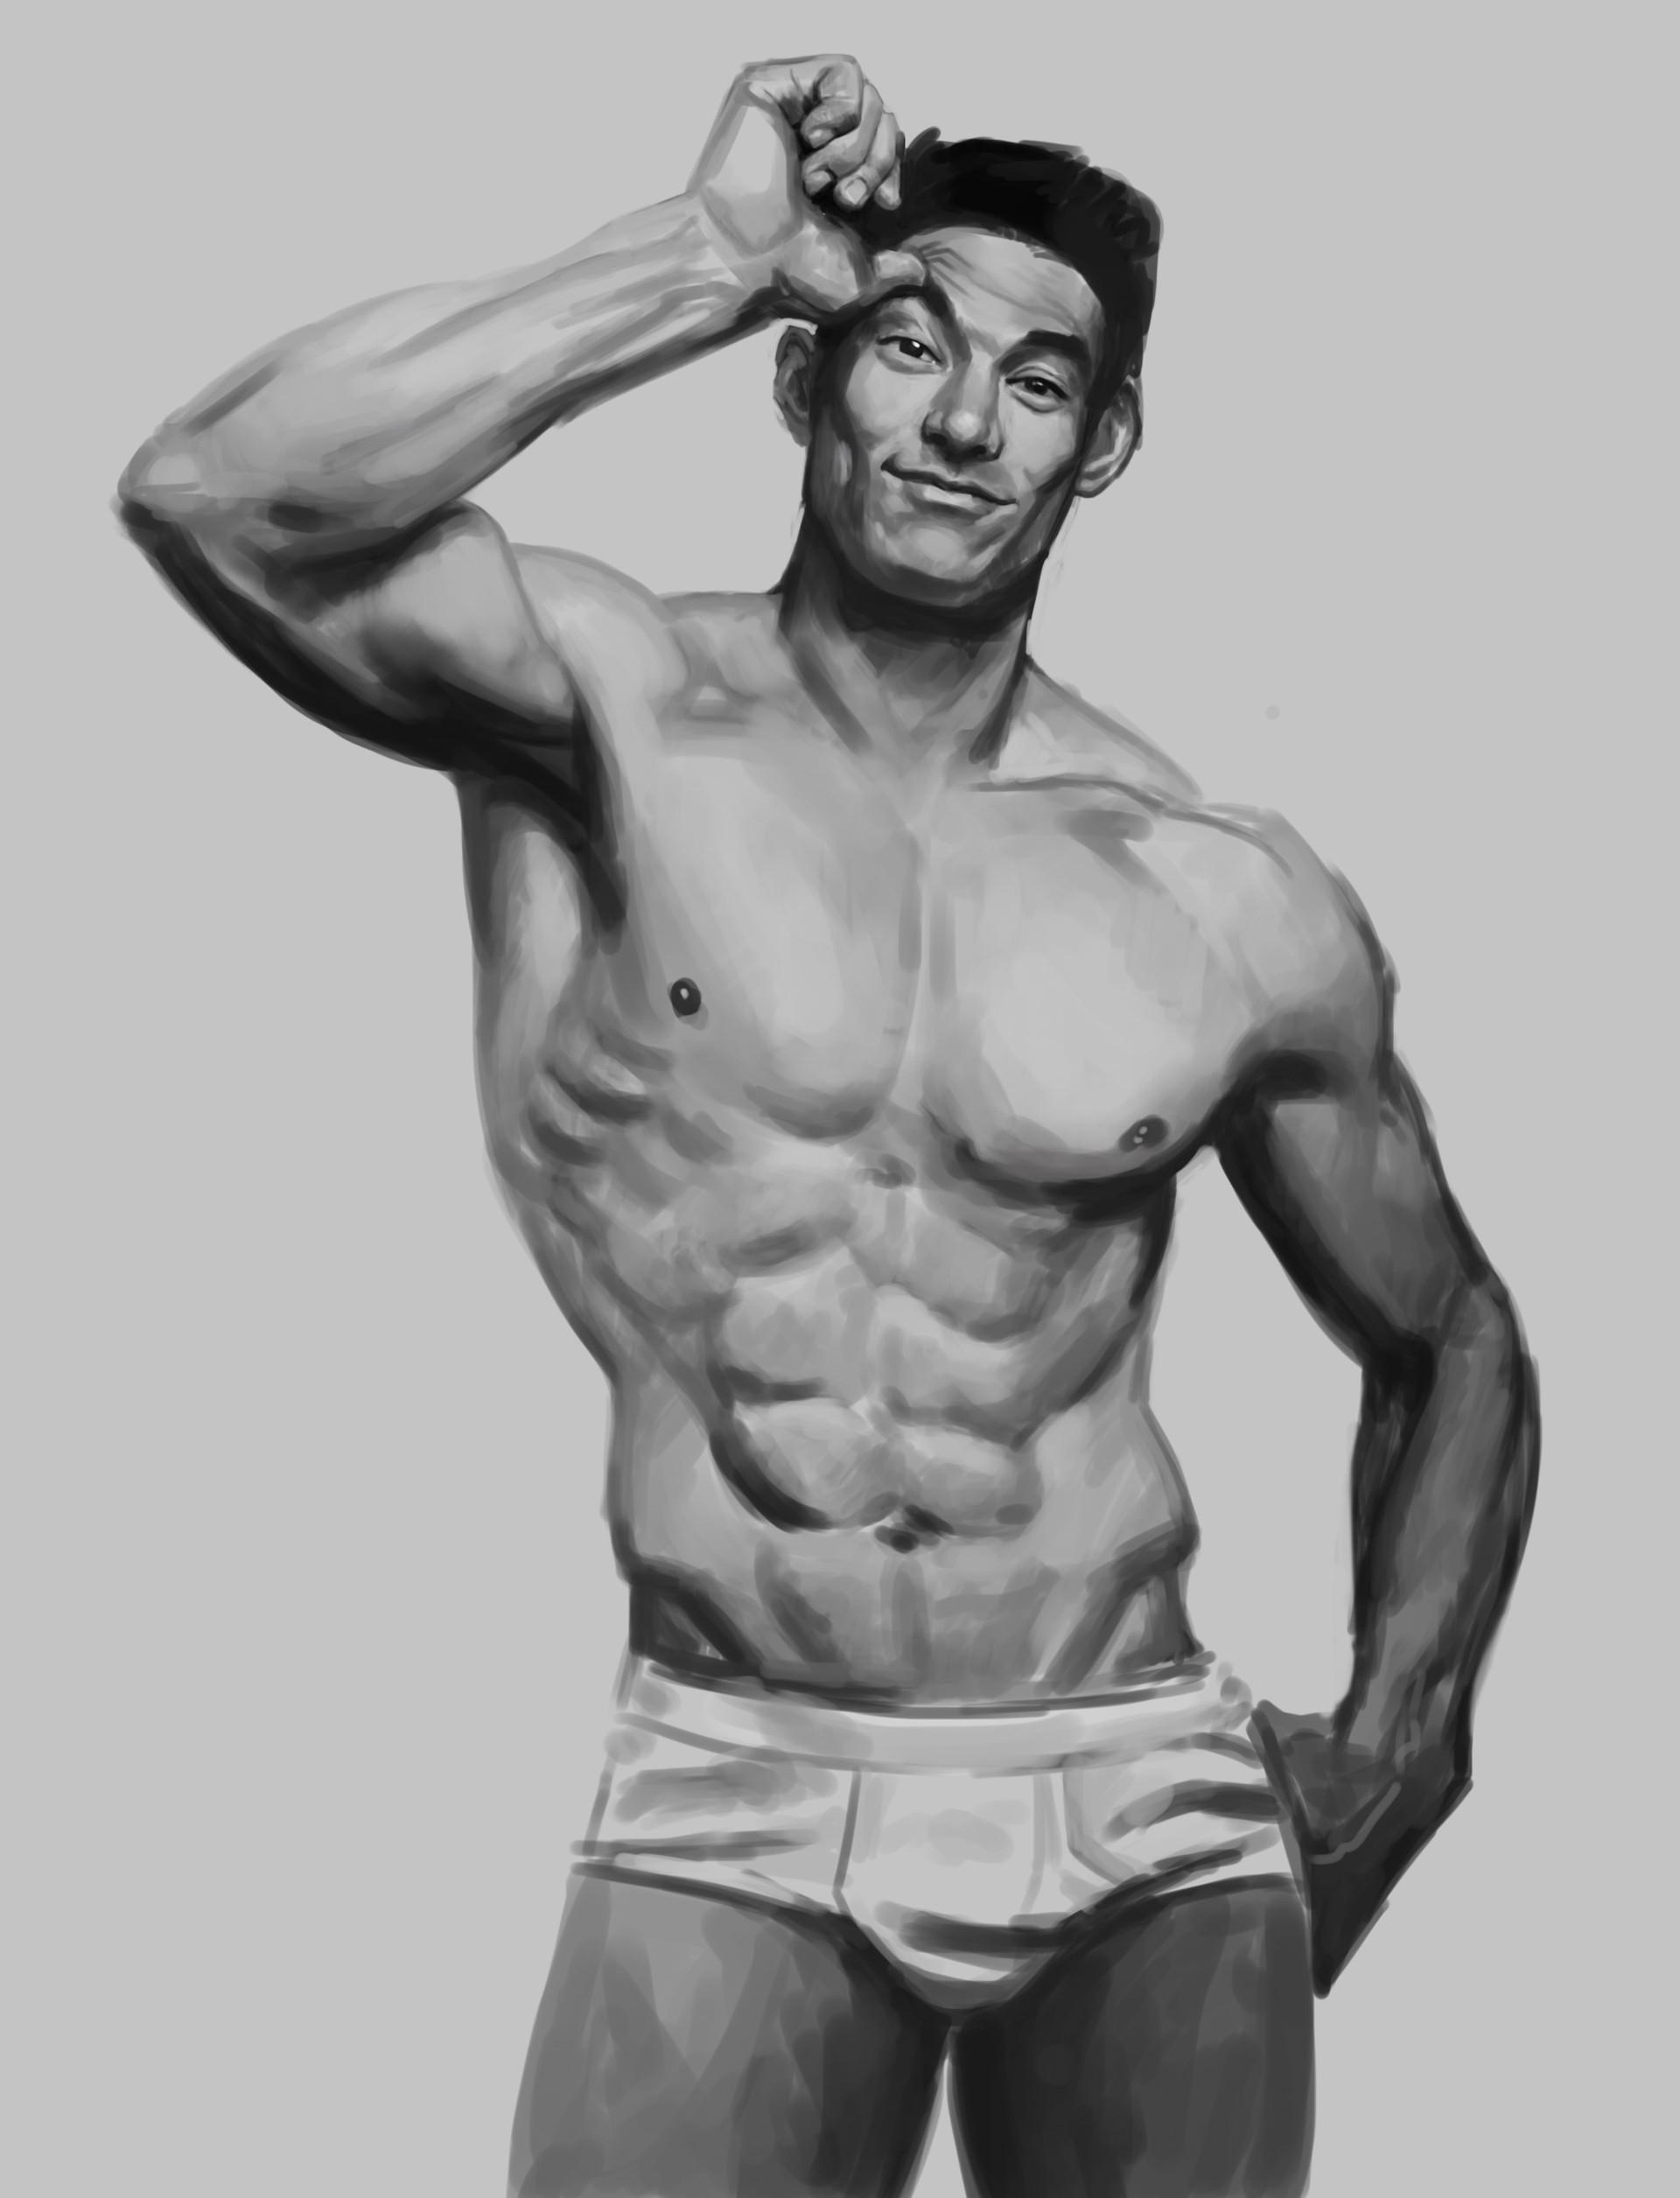 ArtStation - Male Anatomy studies-01, Servando Lupini